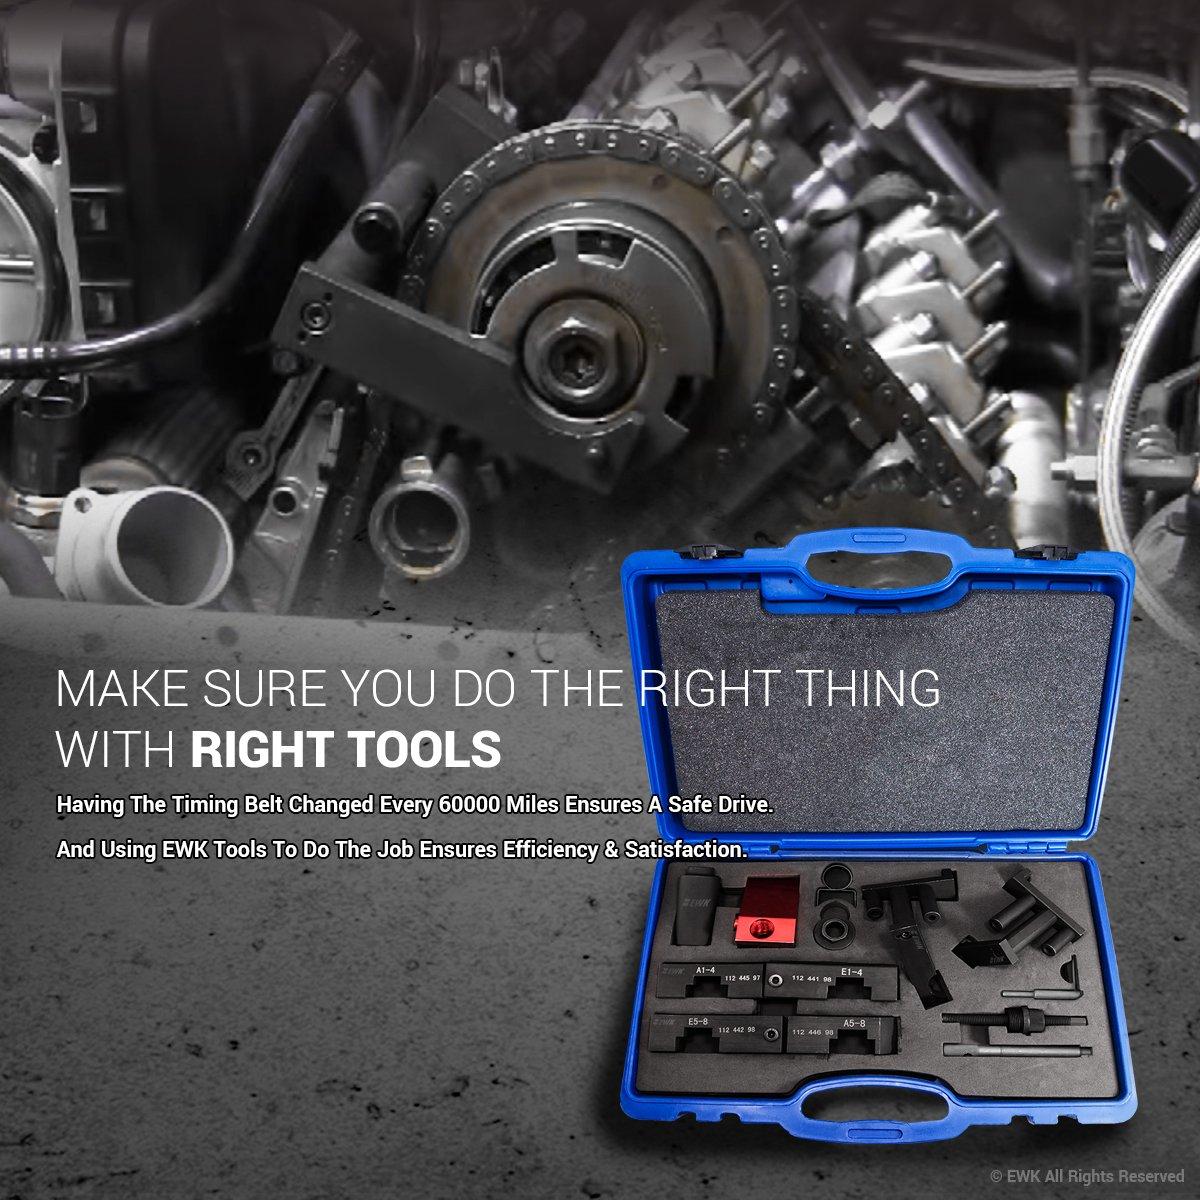 Ewk Vanos Timing Tool Camshaft Lock Alignment For Bmw Range Rover Belt M60 M62 M62tu Automotive